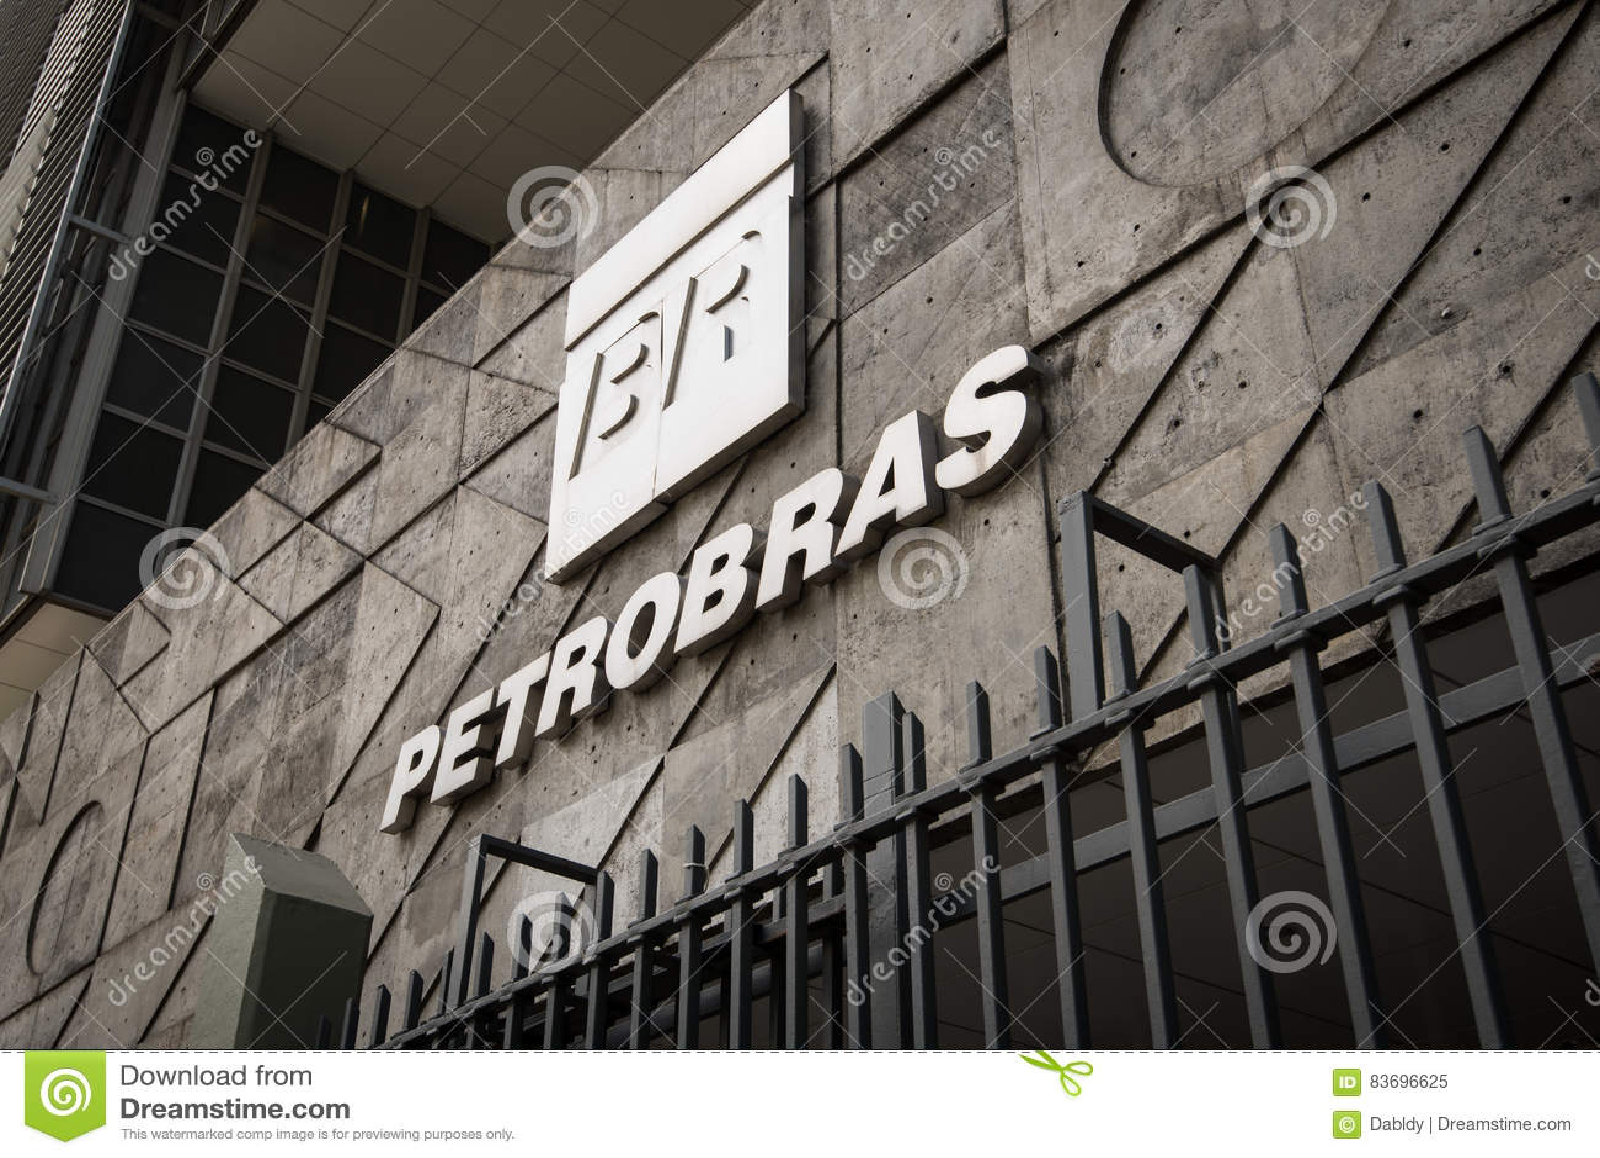 Petrobras Company Logo editorial image  Image of petrobras